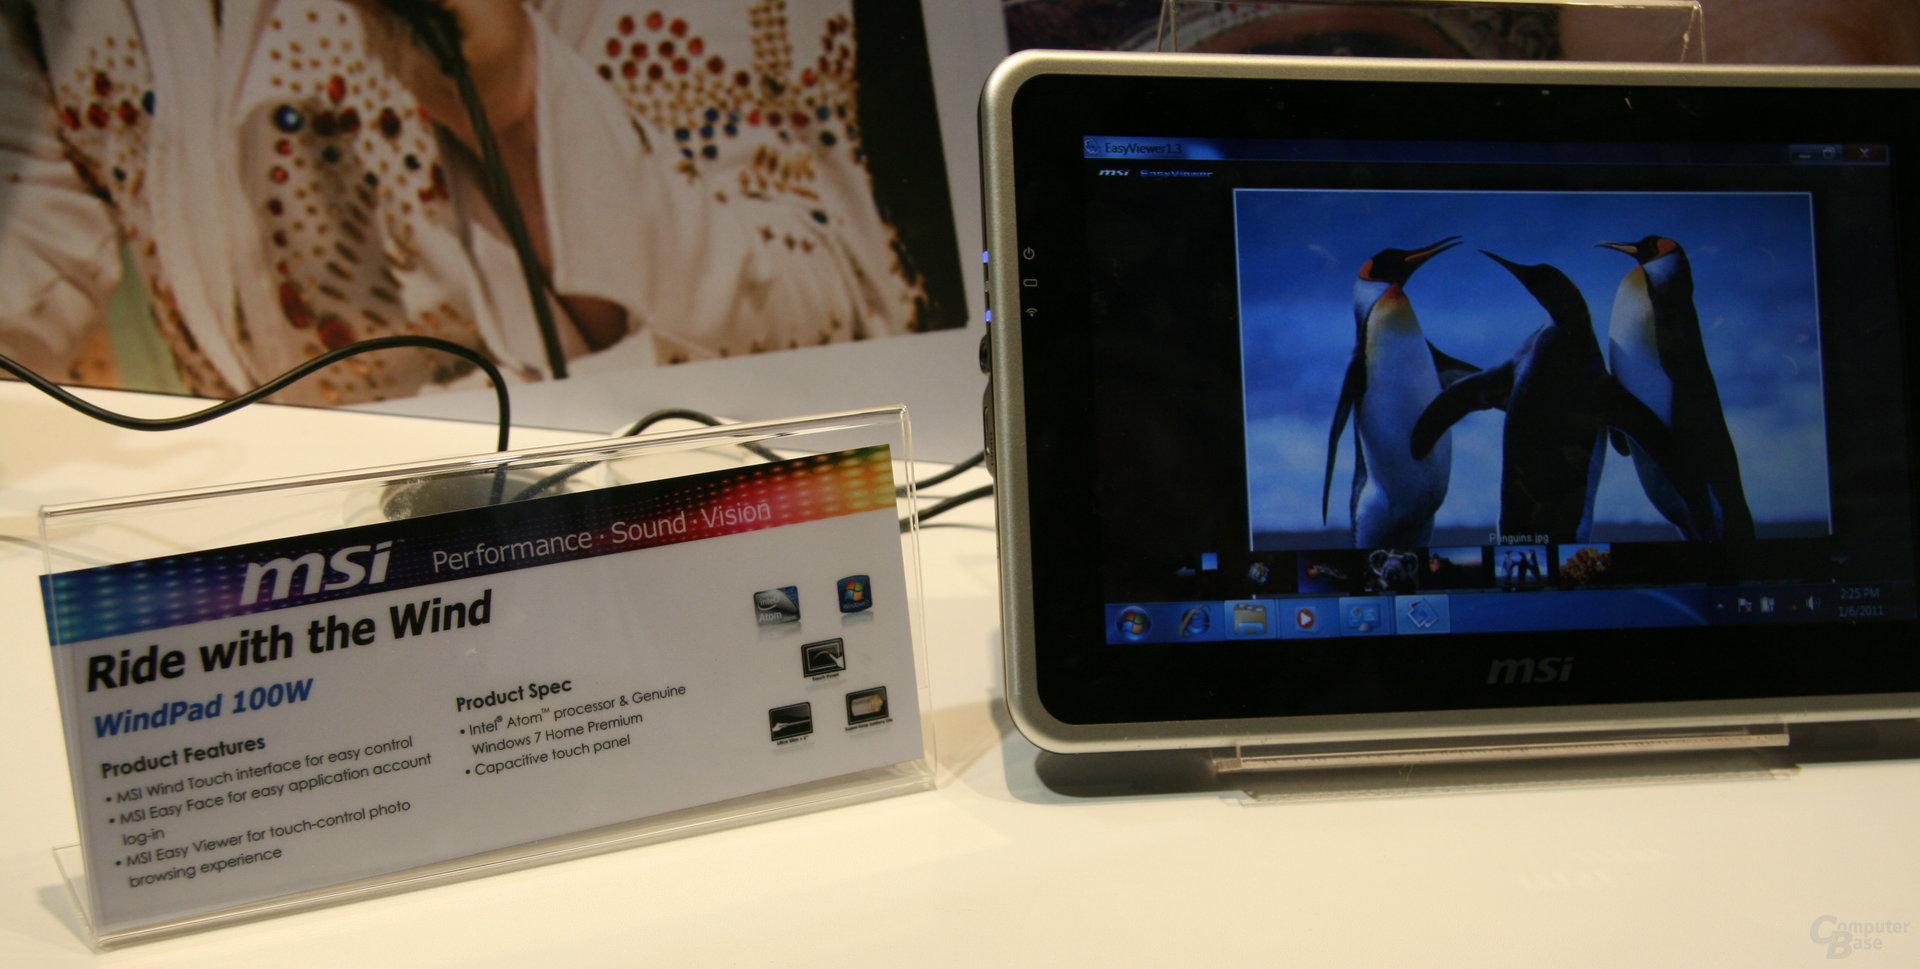 MSI-Tablets auf der CES 2011